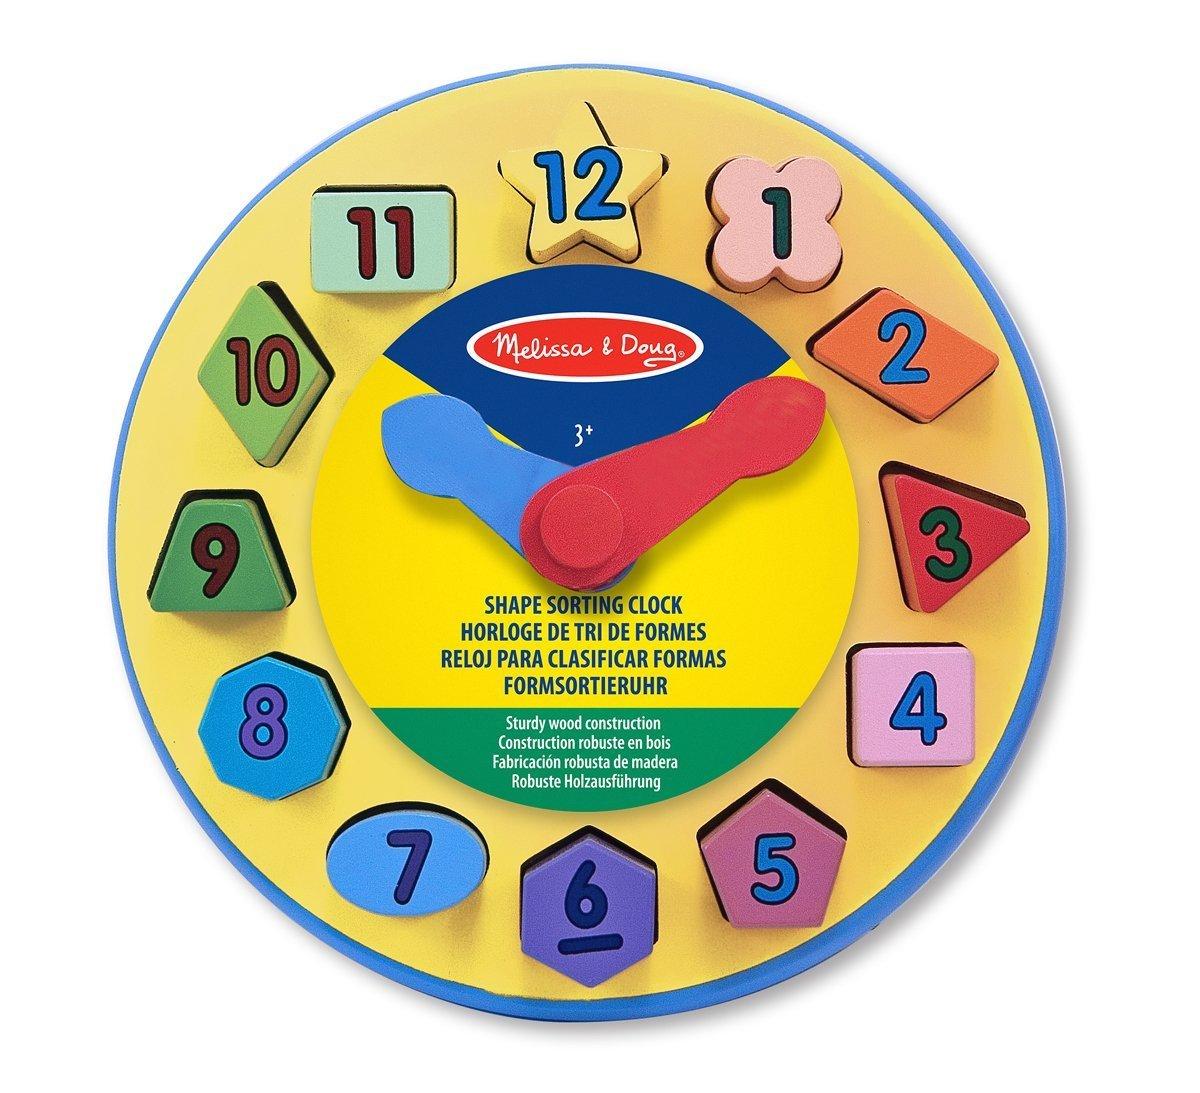 Melissa & Doug Wooden Shape Sorting Clock Educational Toy